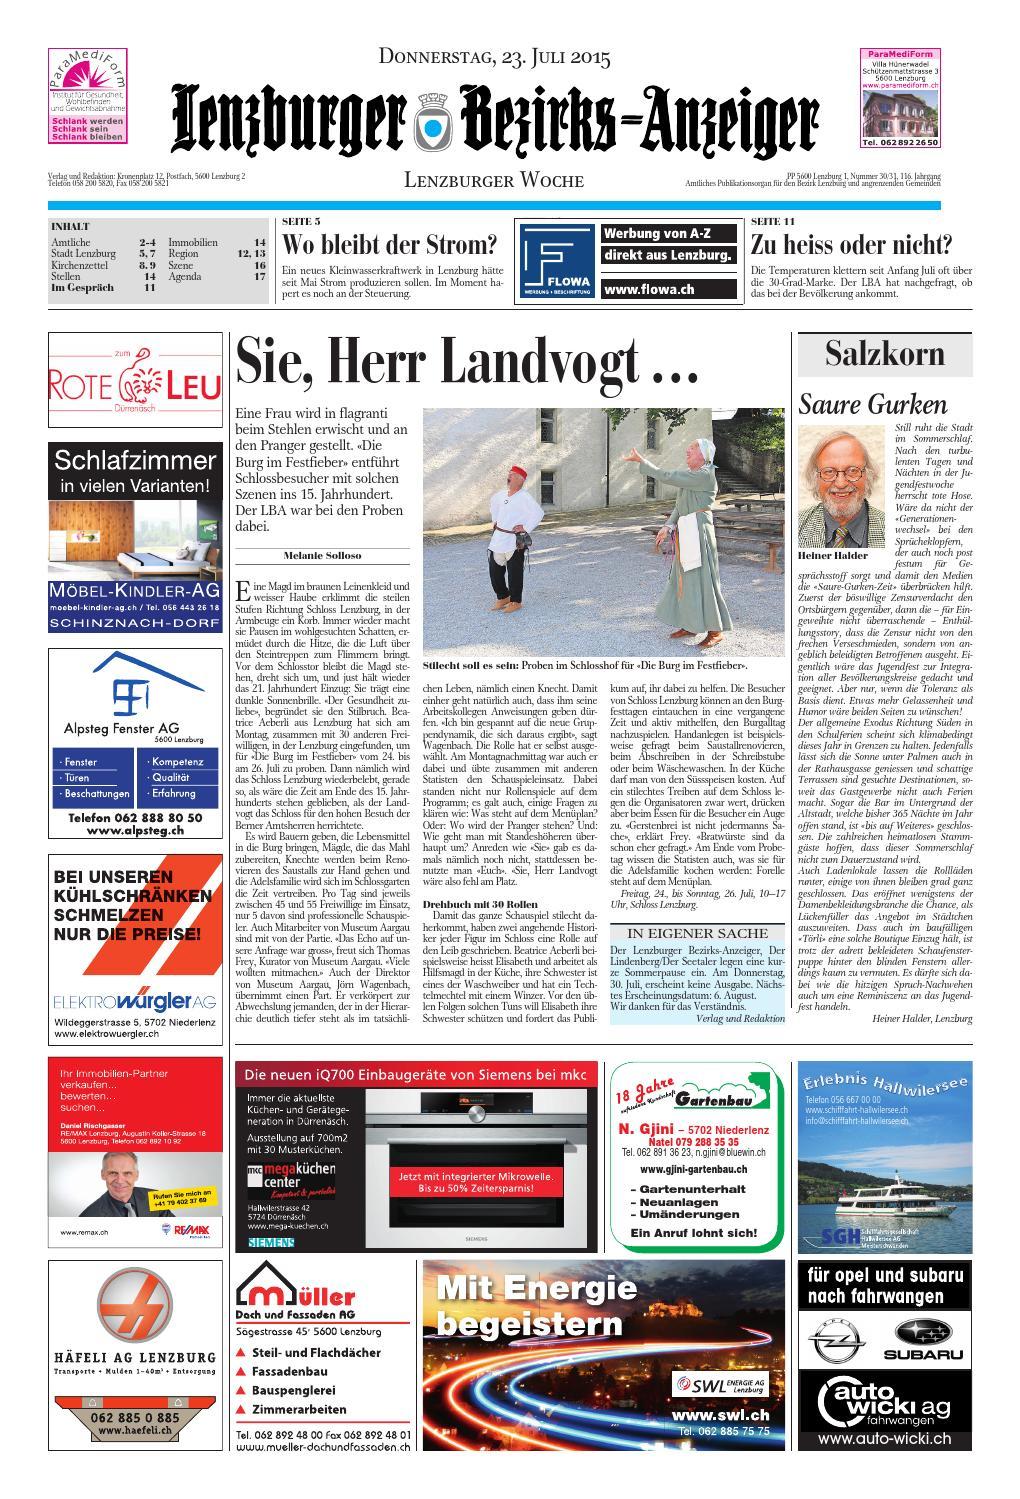 Migros Magazin 27 2010 d VS by Migros-Genossenschafts